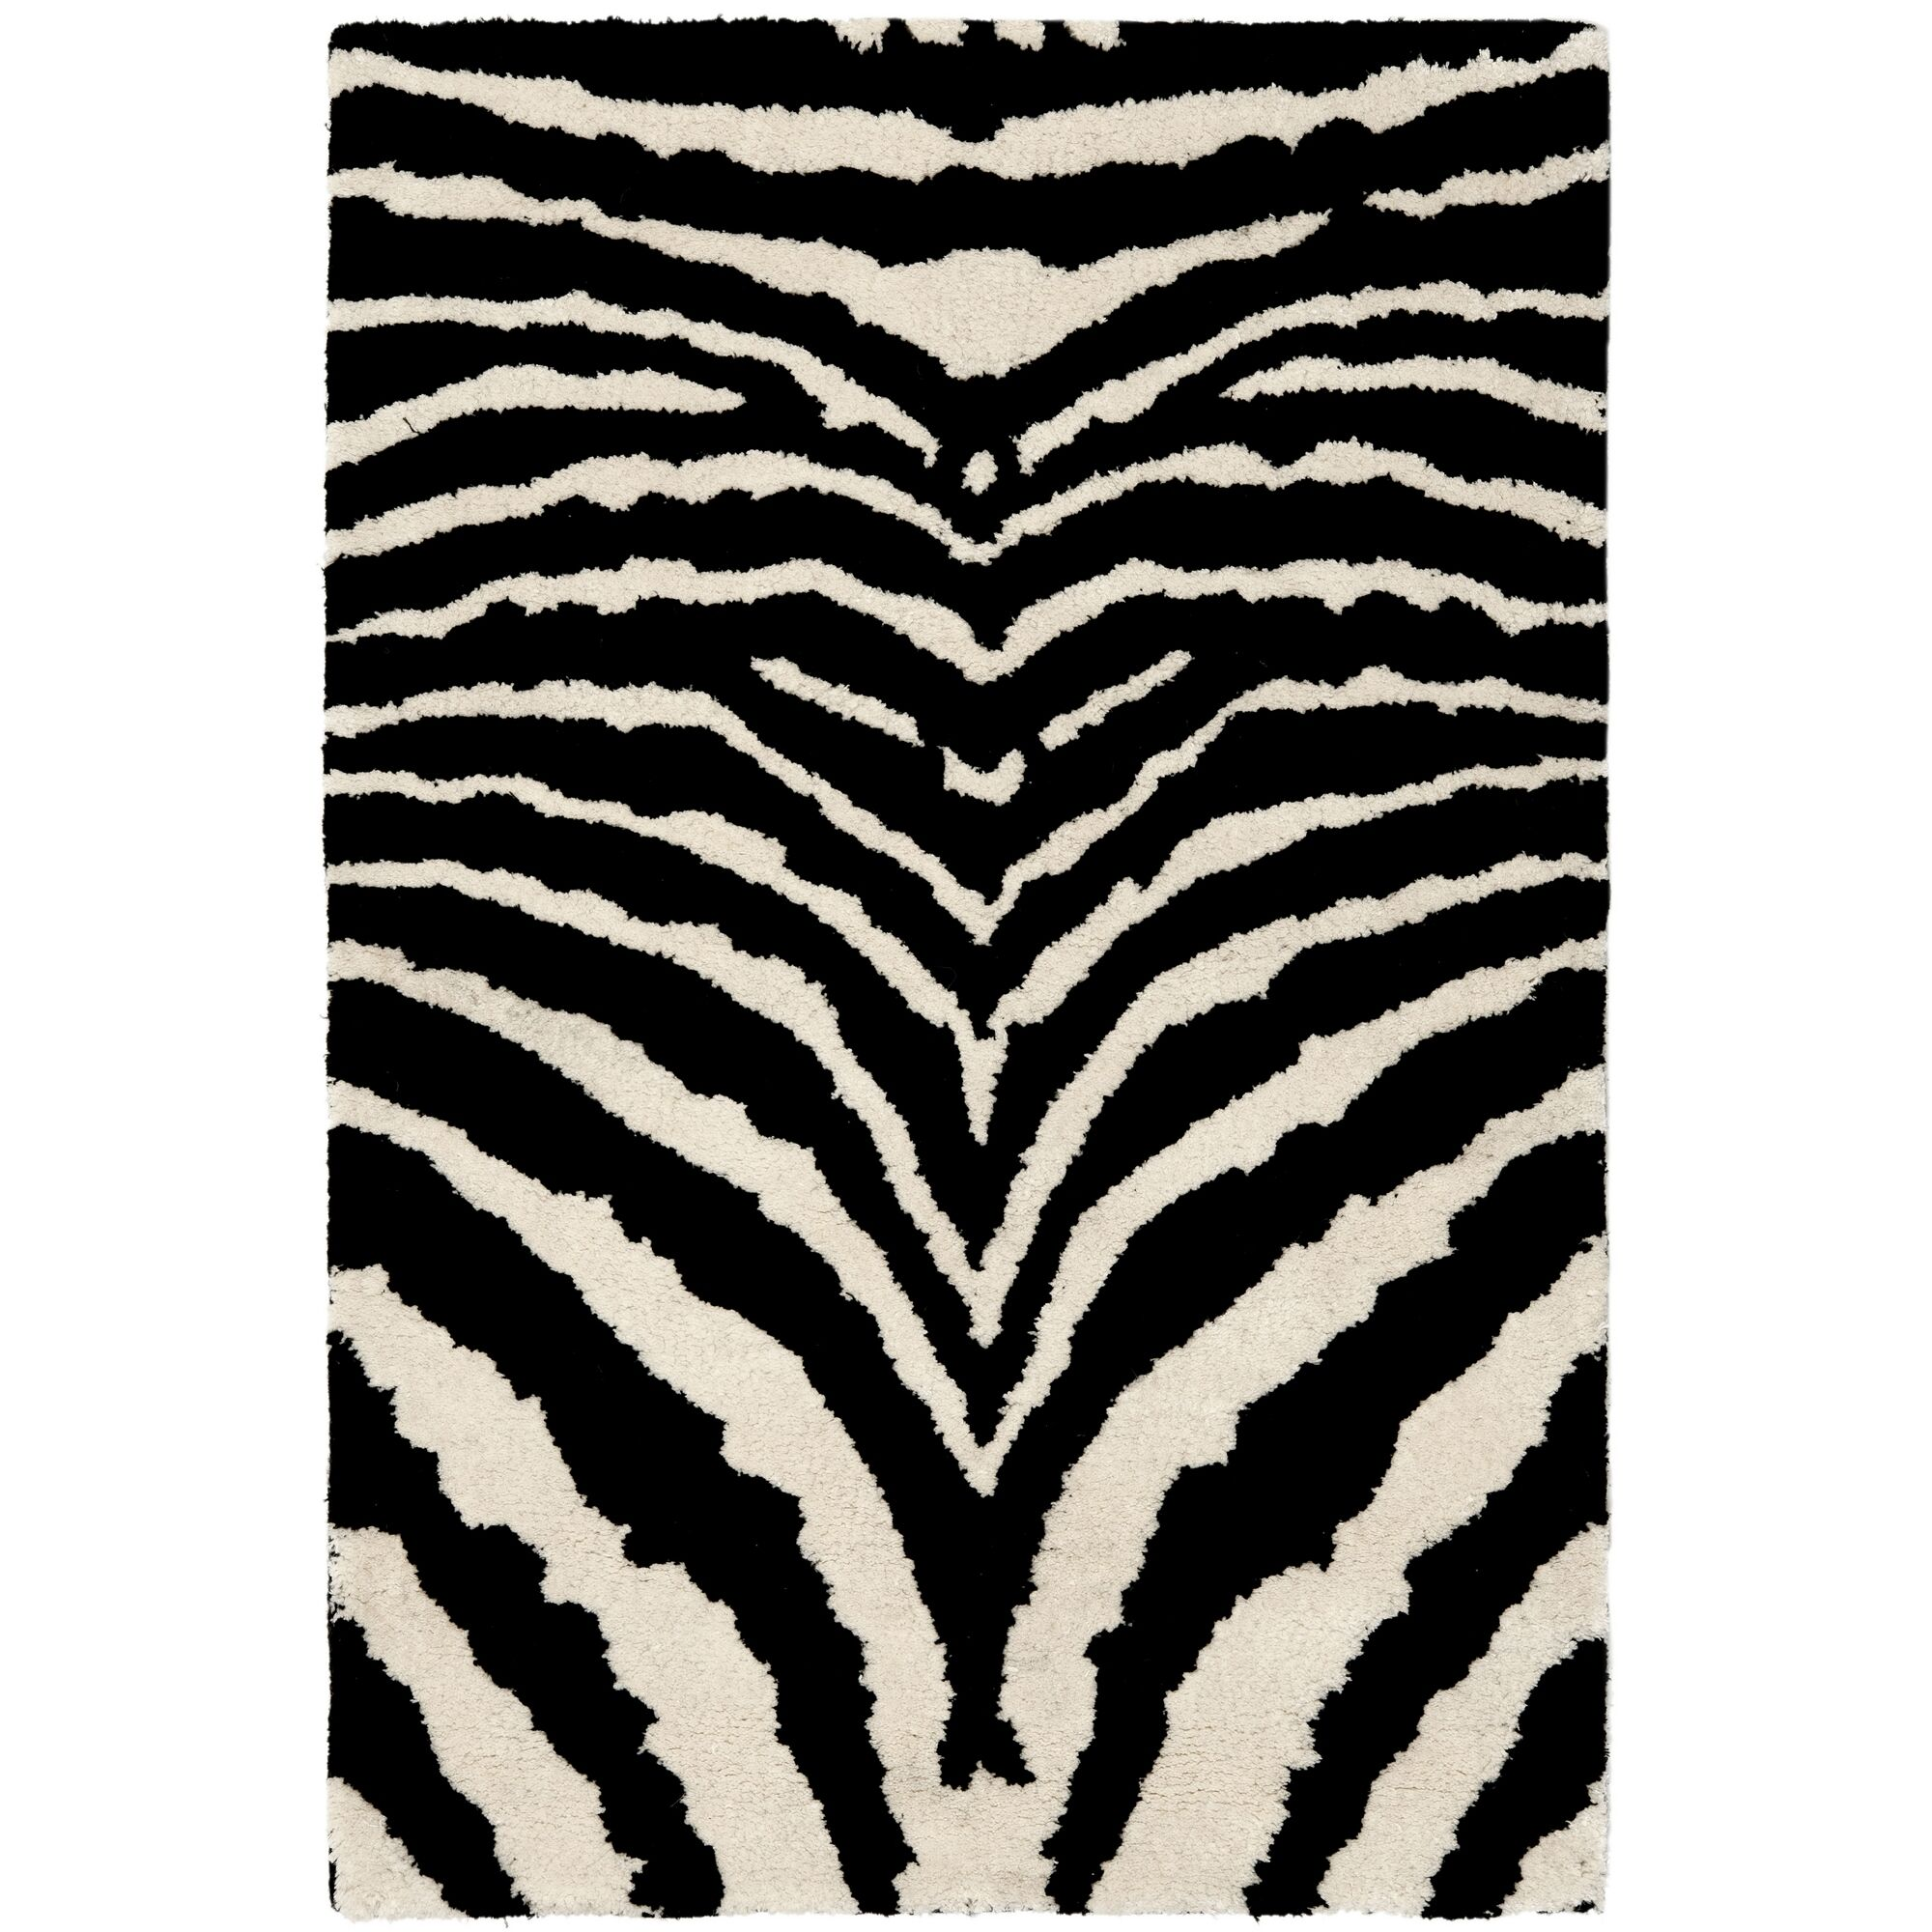 Dorthy Wool Ivory/Black Area Rug Rug Size: Rectangle 9'6